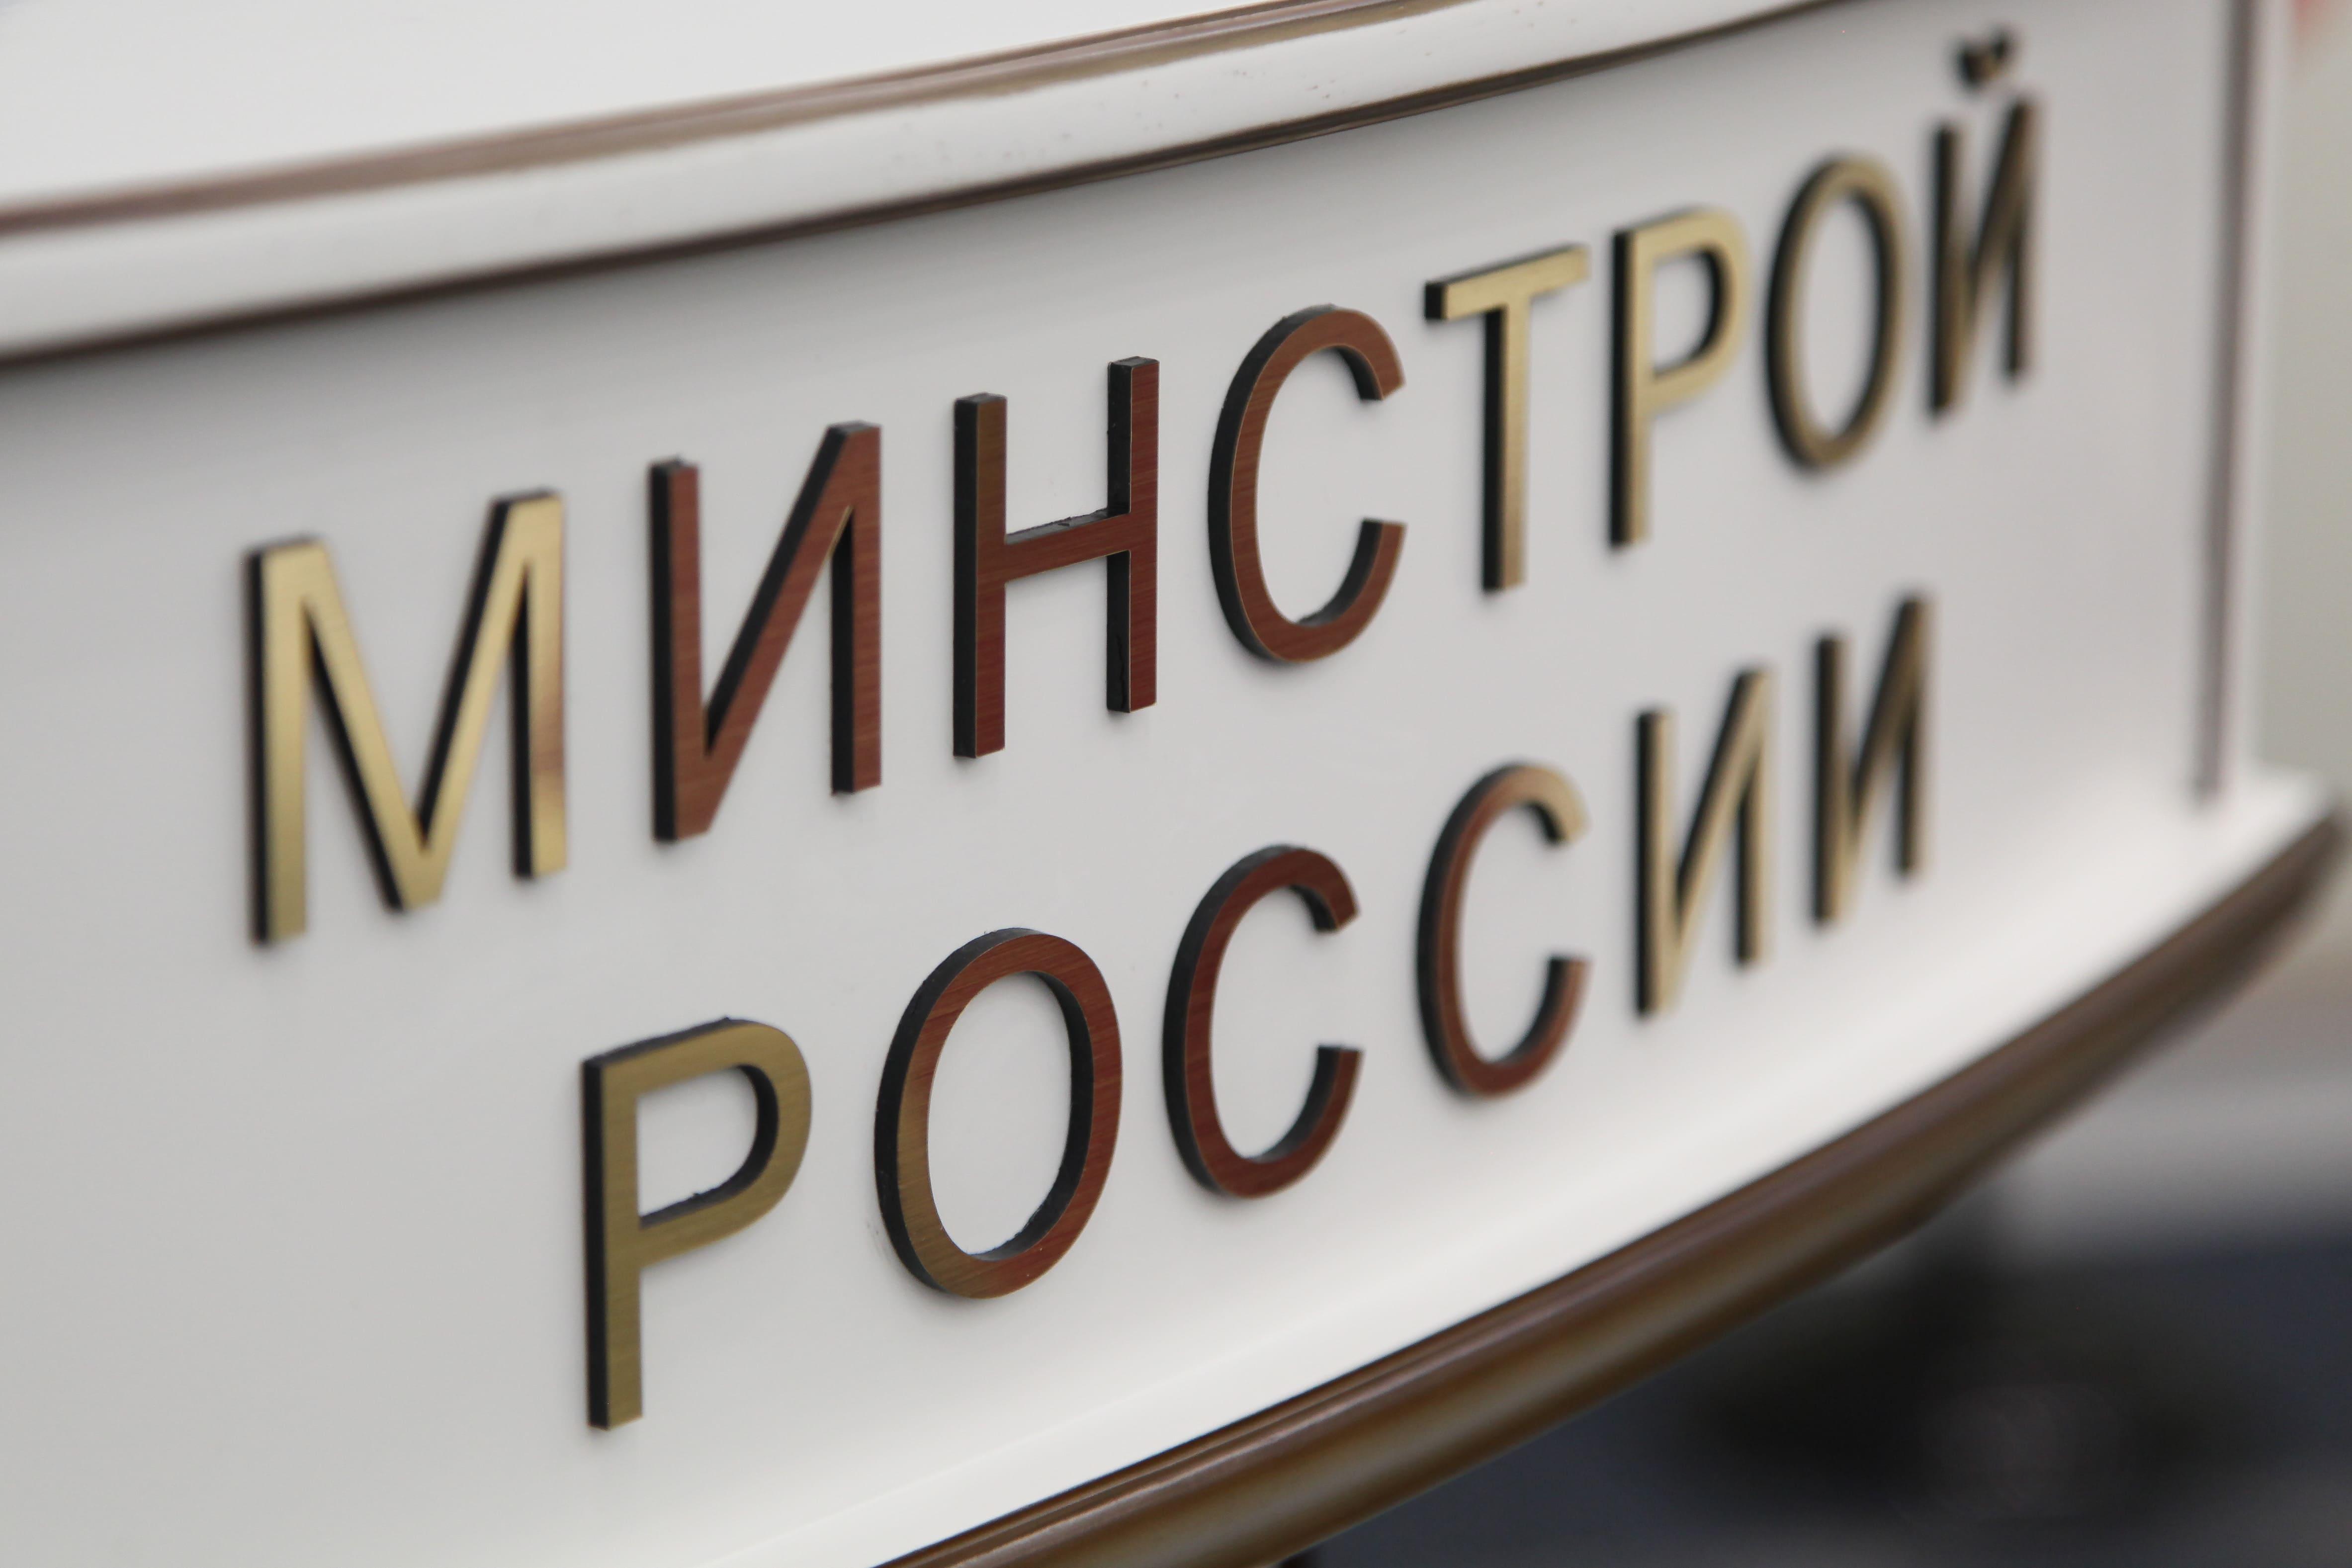 http://www.minstroyrf.ru/upload/iblock/cf1/Nadpis-Minstroy.jpg.jpg